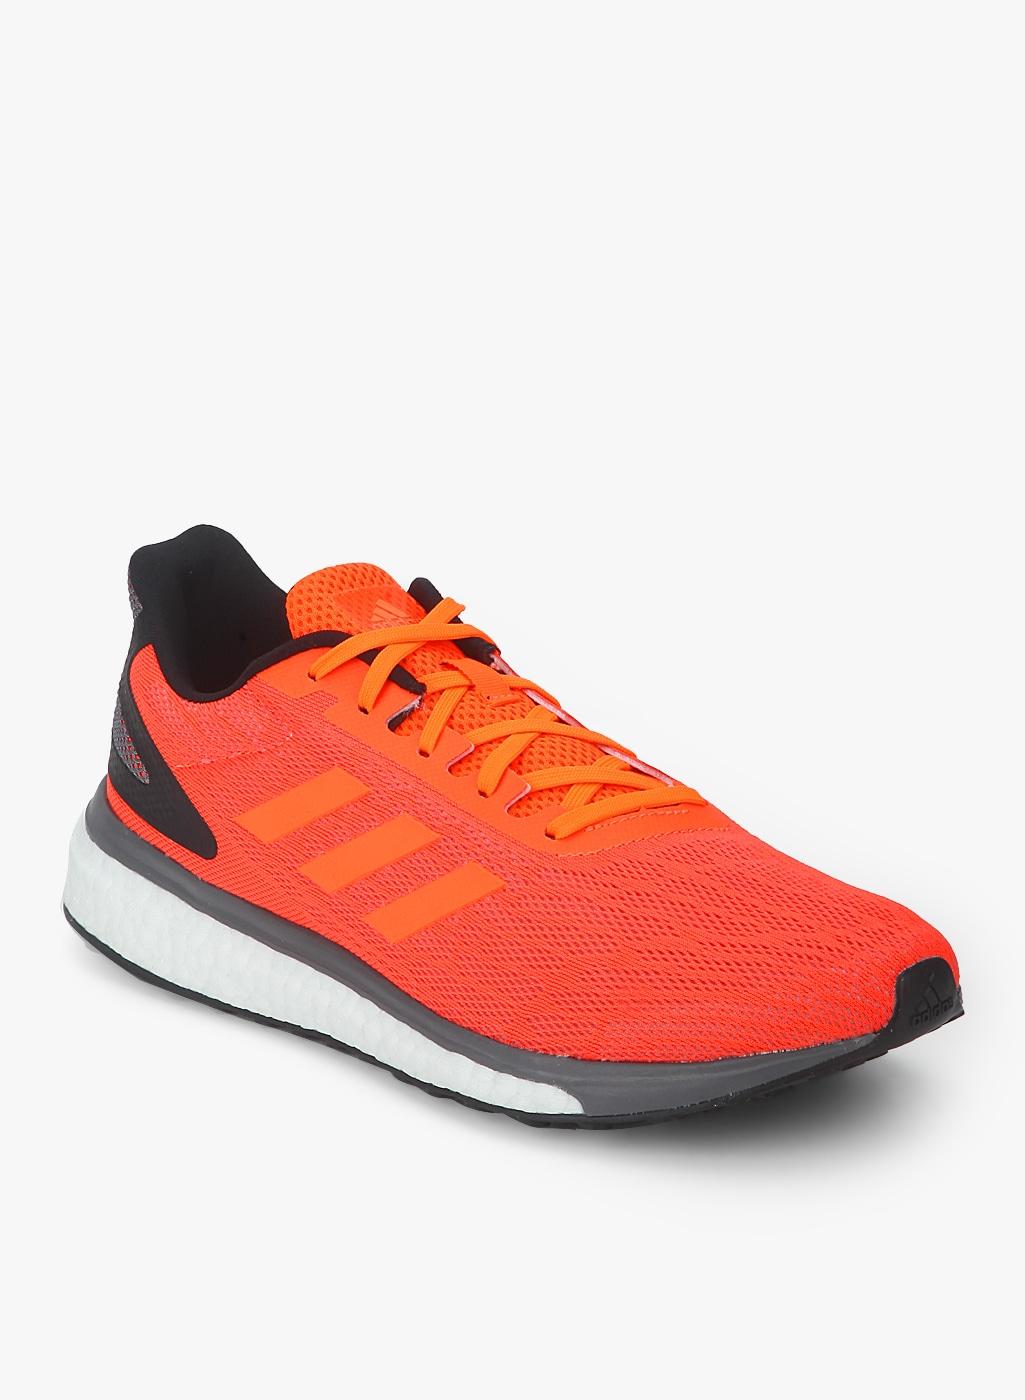 Adidas Men Orange Black Running Shoes - Buy Adidas Men Orange Black Running  Shoes online in India 431f33996